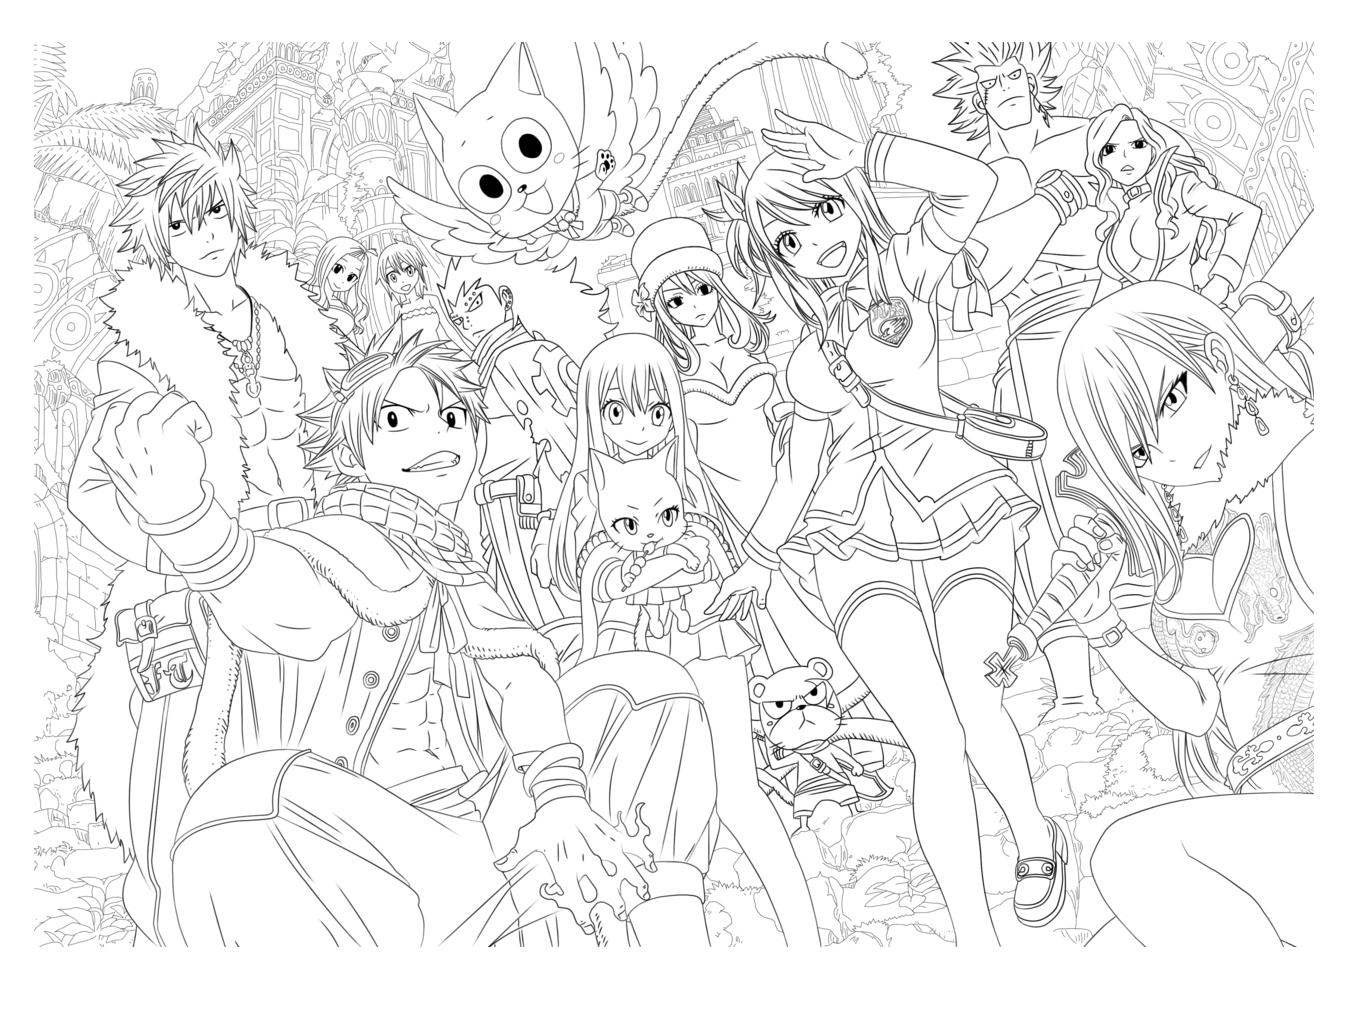 Mangas 26575 Mangas Malbuch Fur Erwachsene